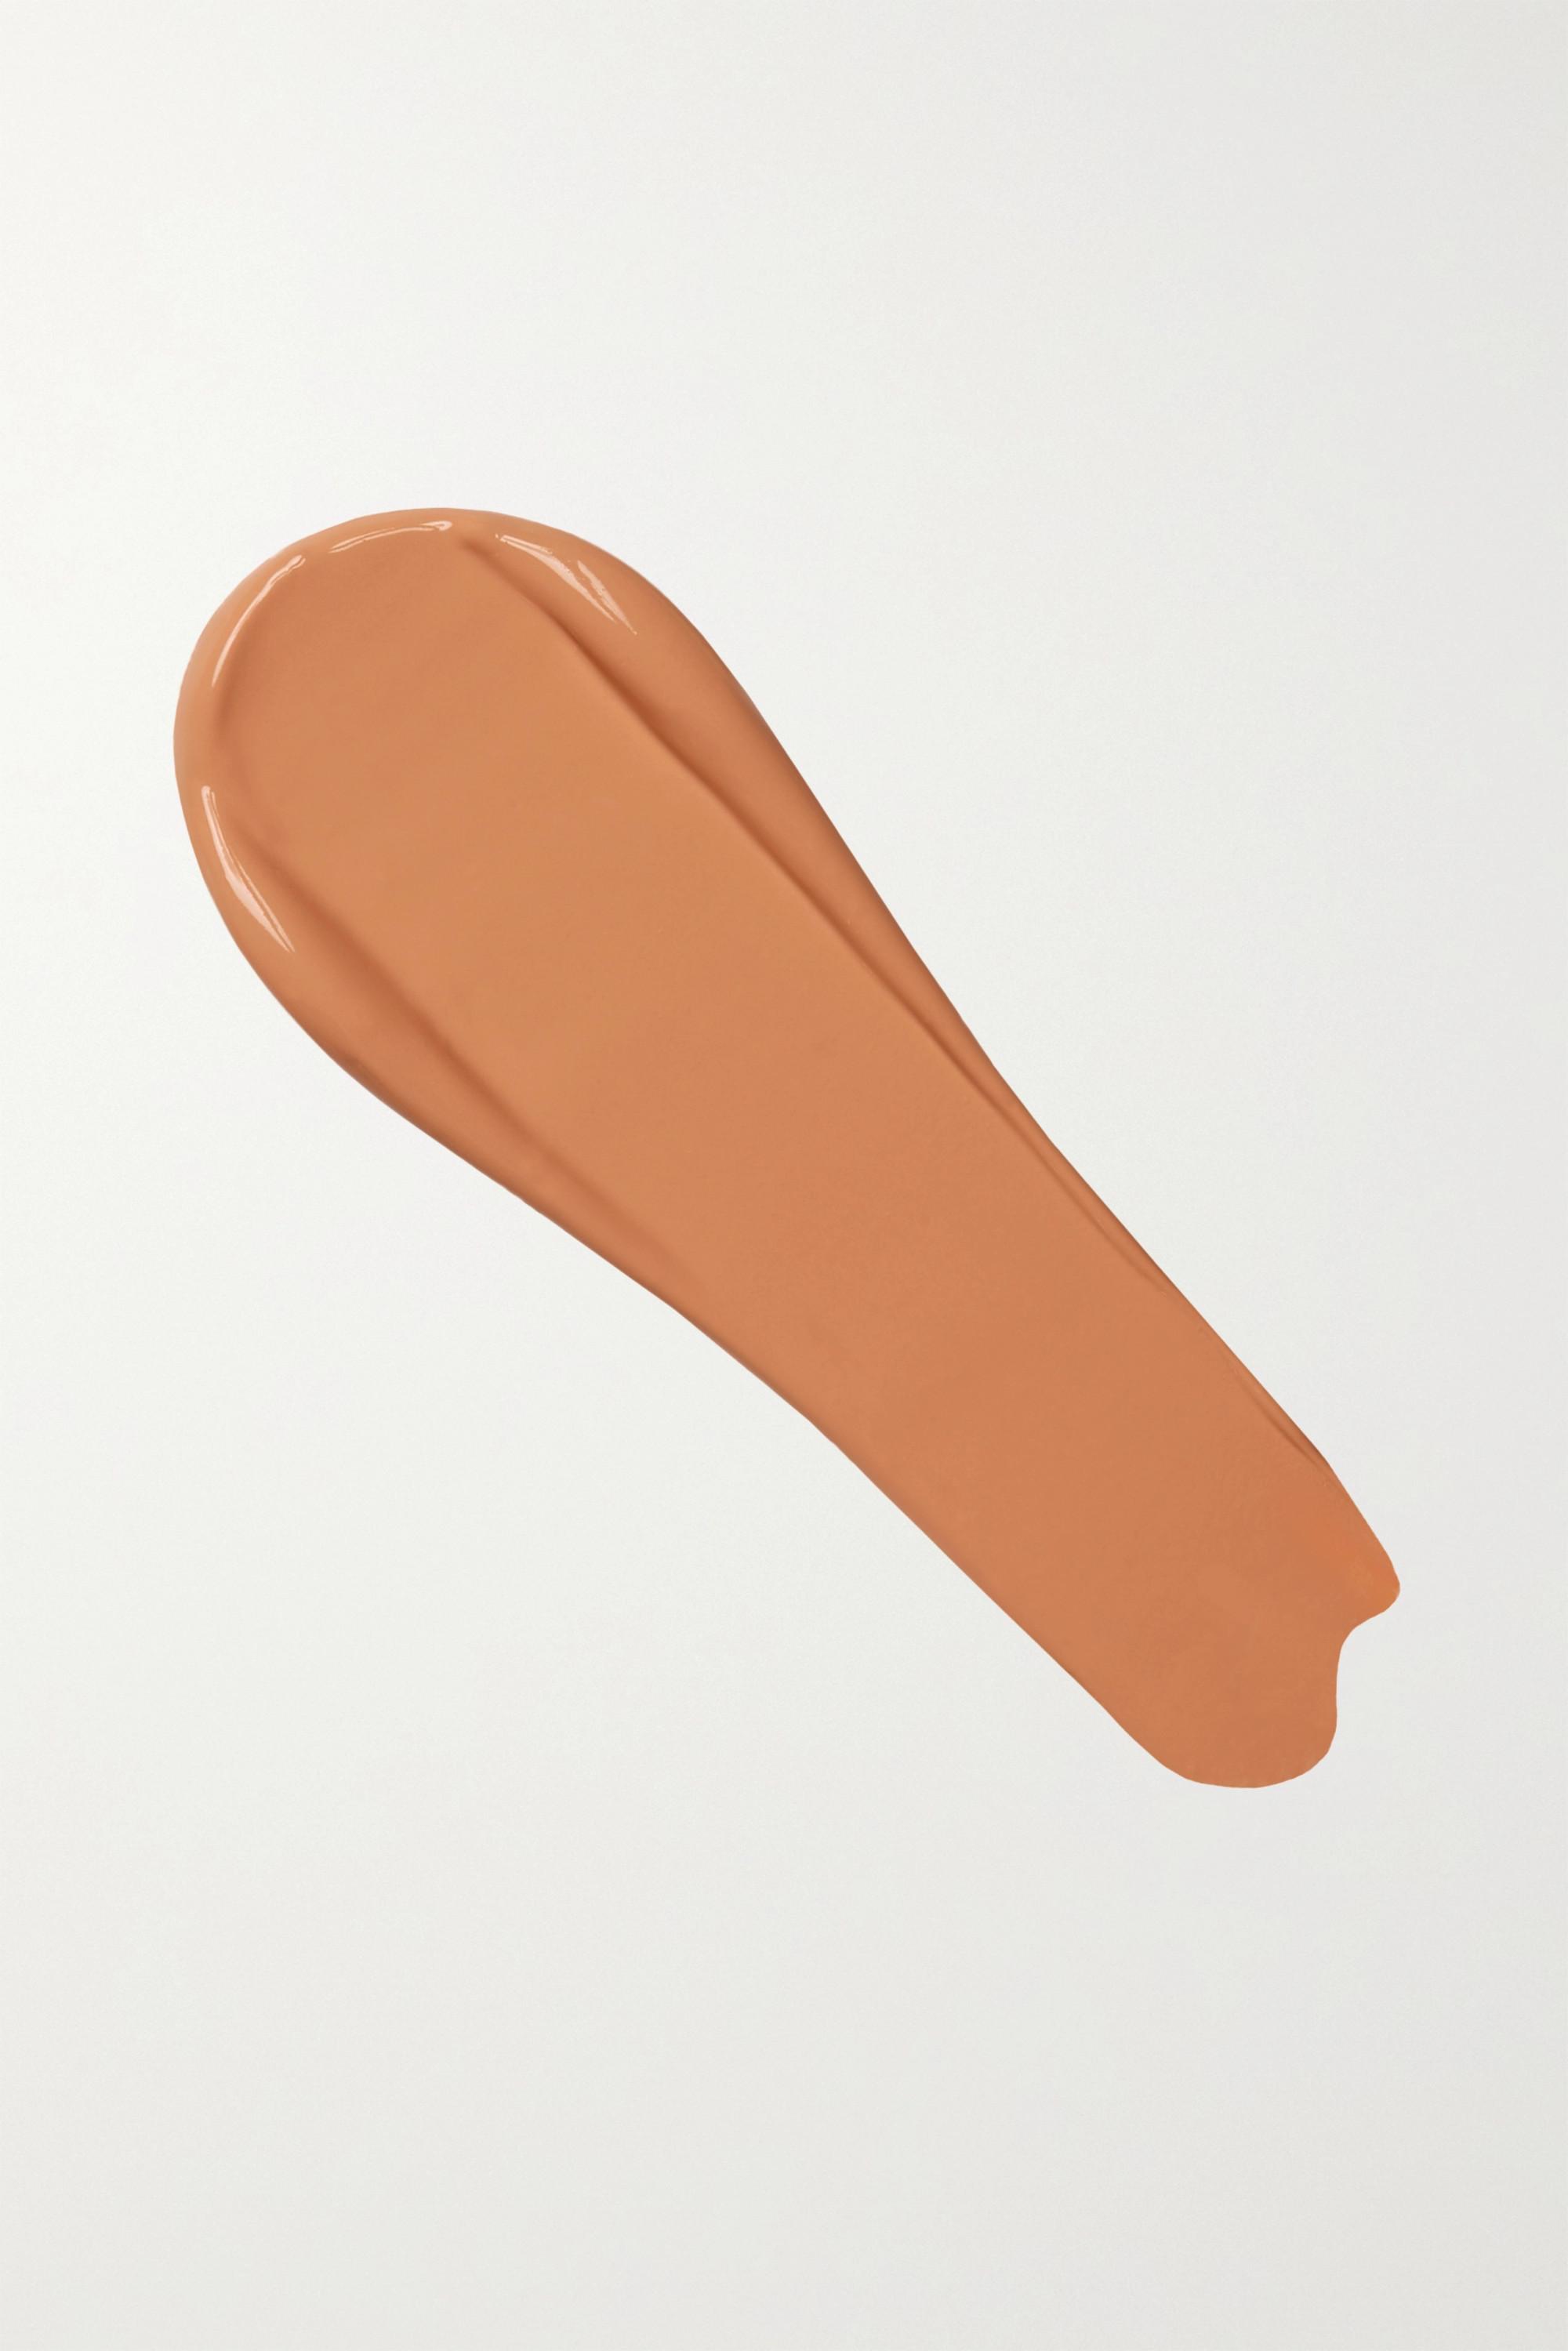 Pat McGrath Labs Skin Fetish: Sublime Perfection Concealer - M20, 5ml